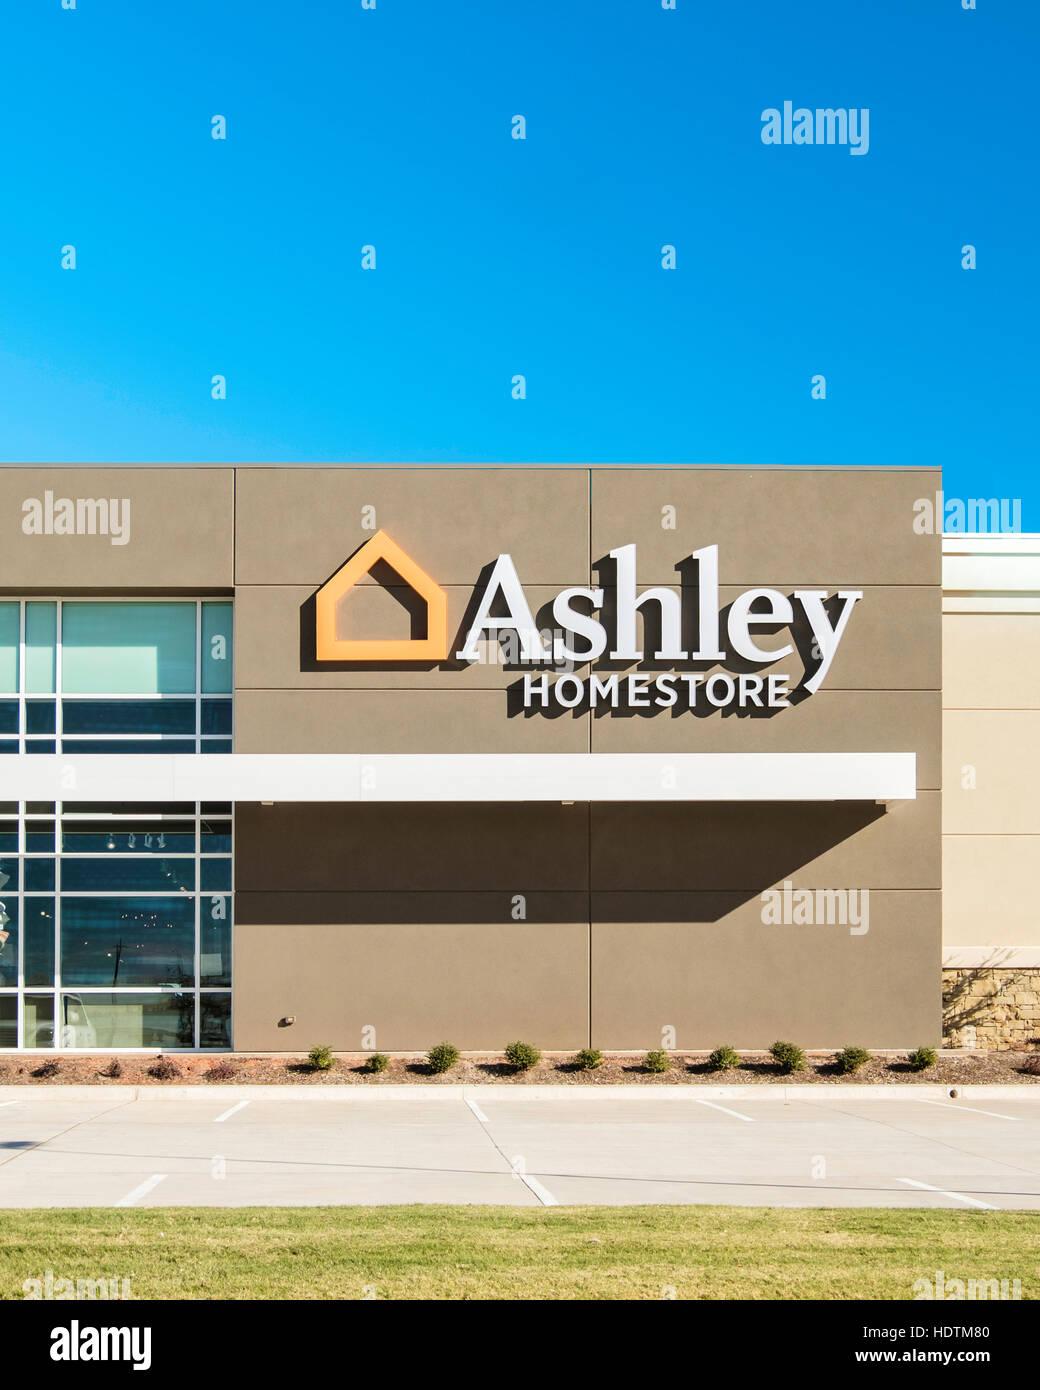 Ashley Homestore, A Decor And Furniture Store On Memorial Road In North Oklahoma  City, Oklahoma, USA